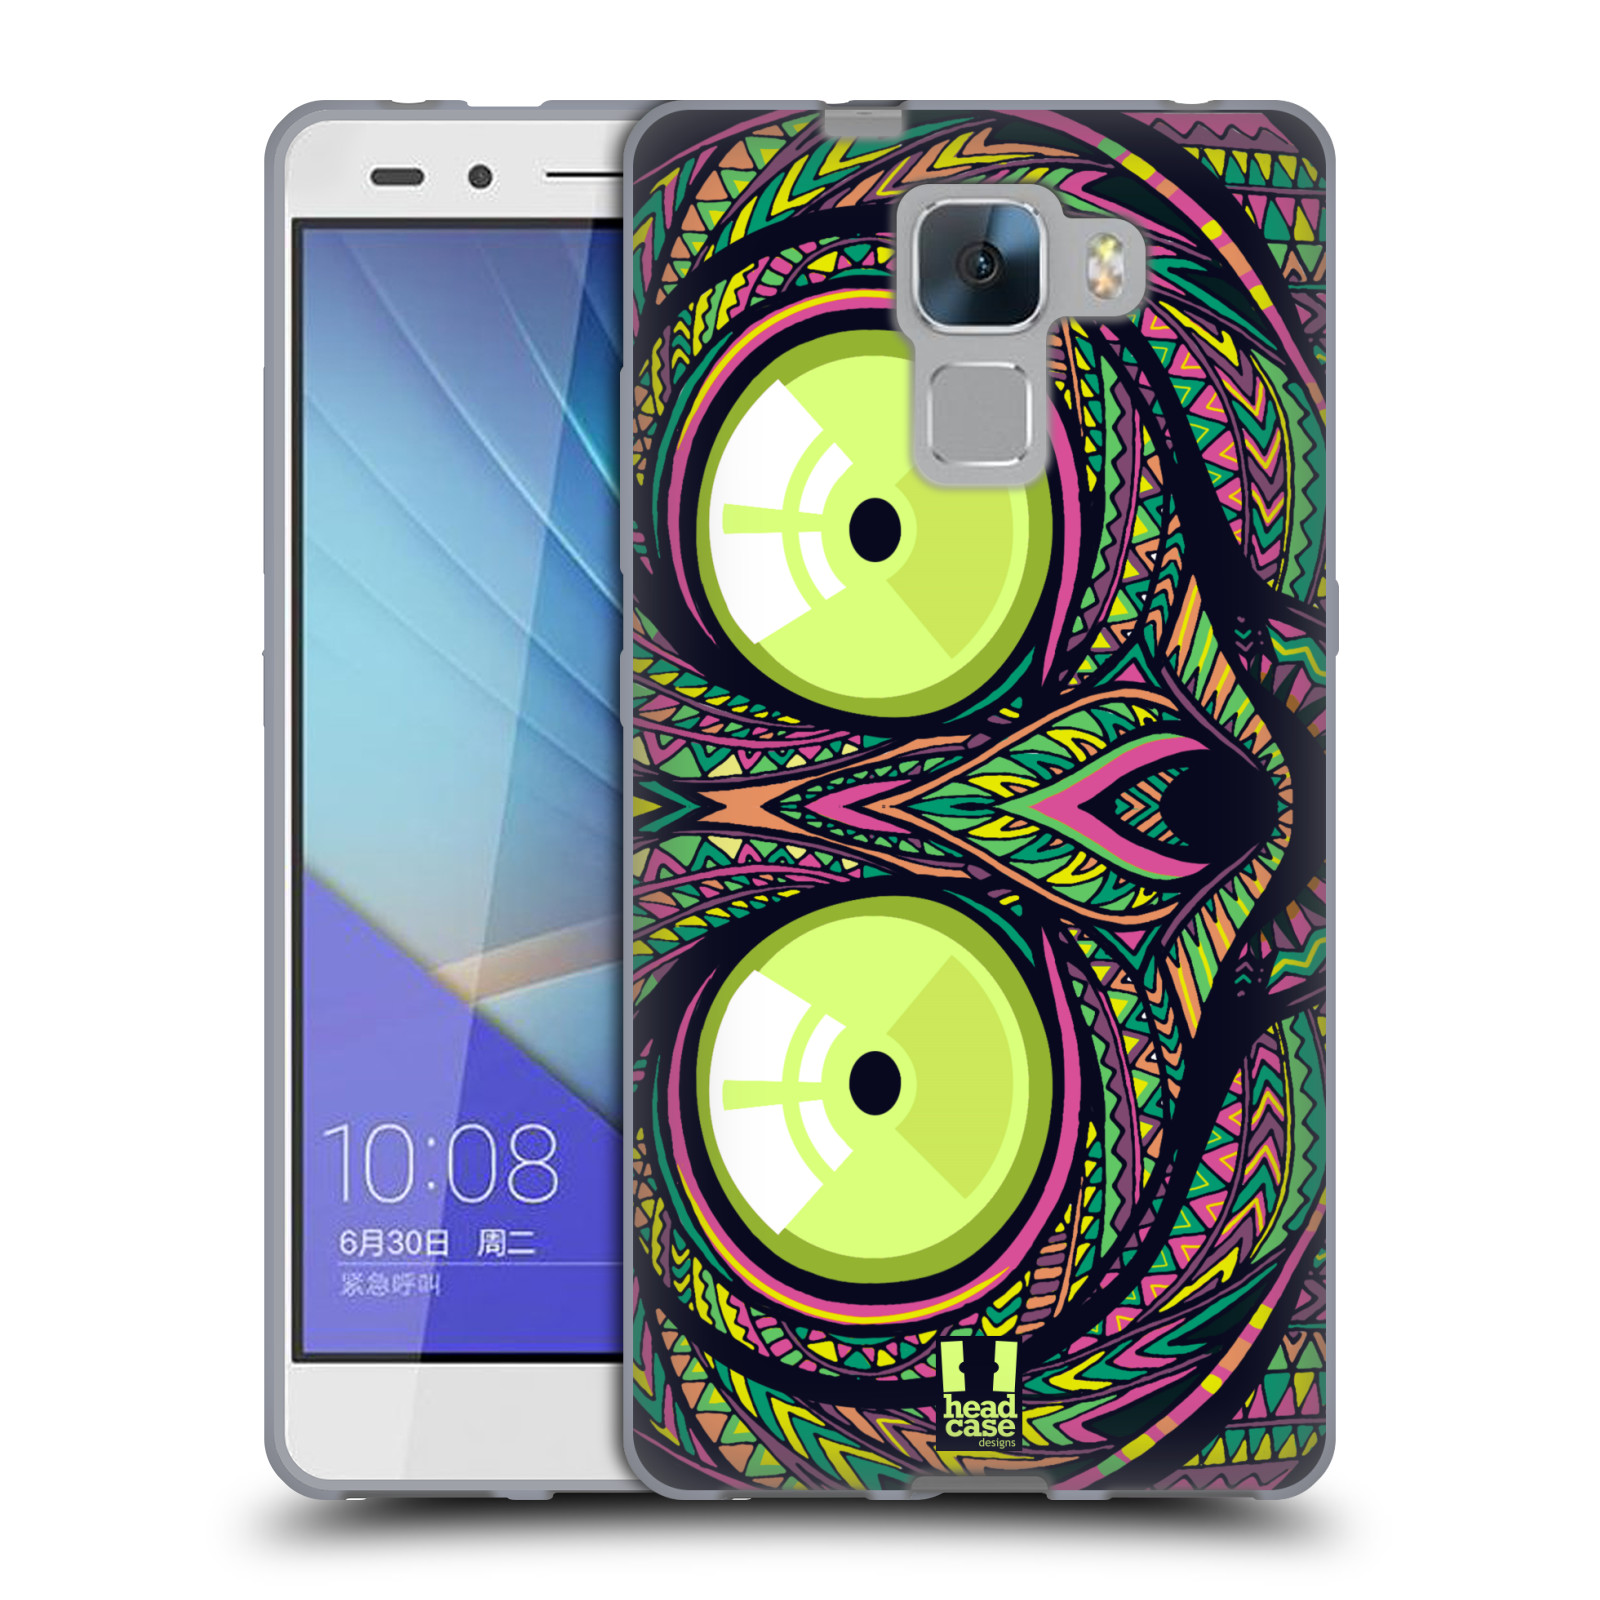 Silikonové pouzdro na mobil Honor 7 HEAD CASE AZTEC NÁRTOUN